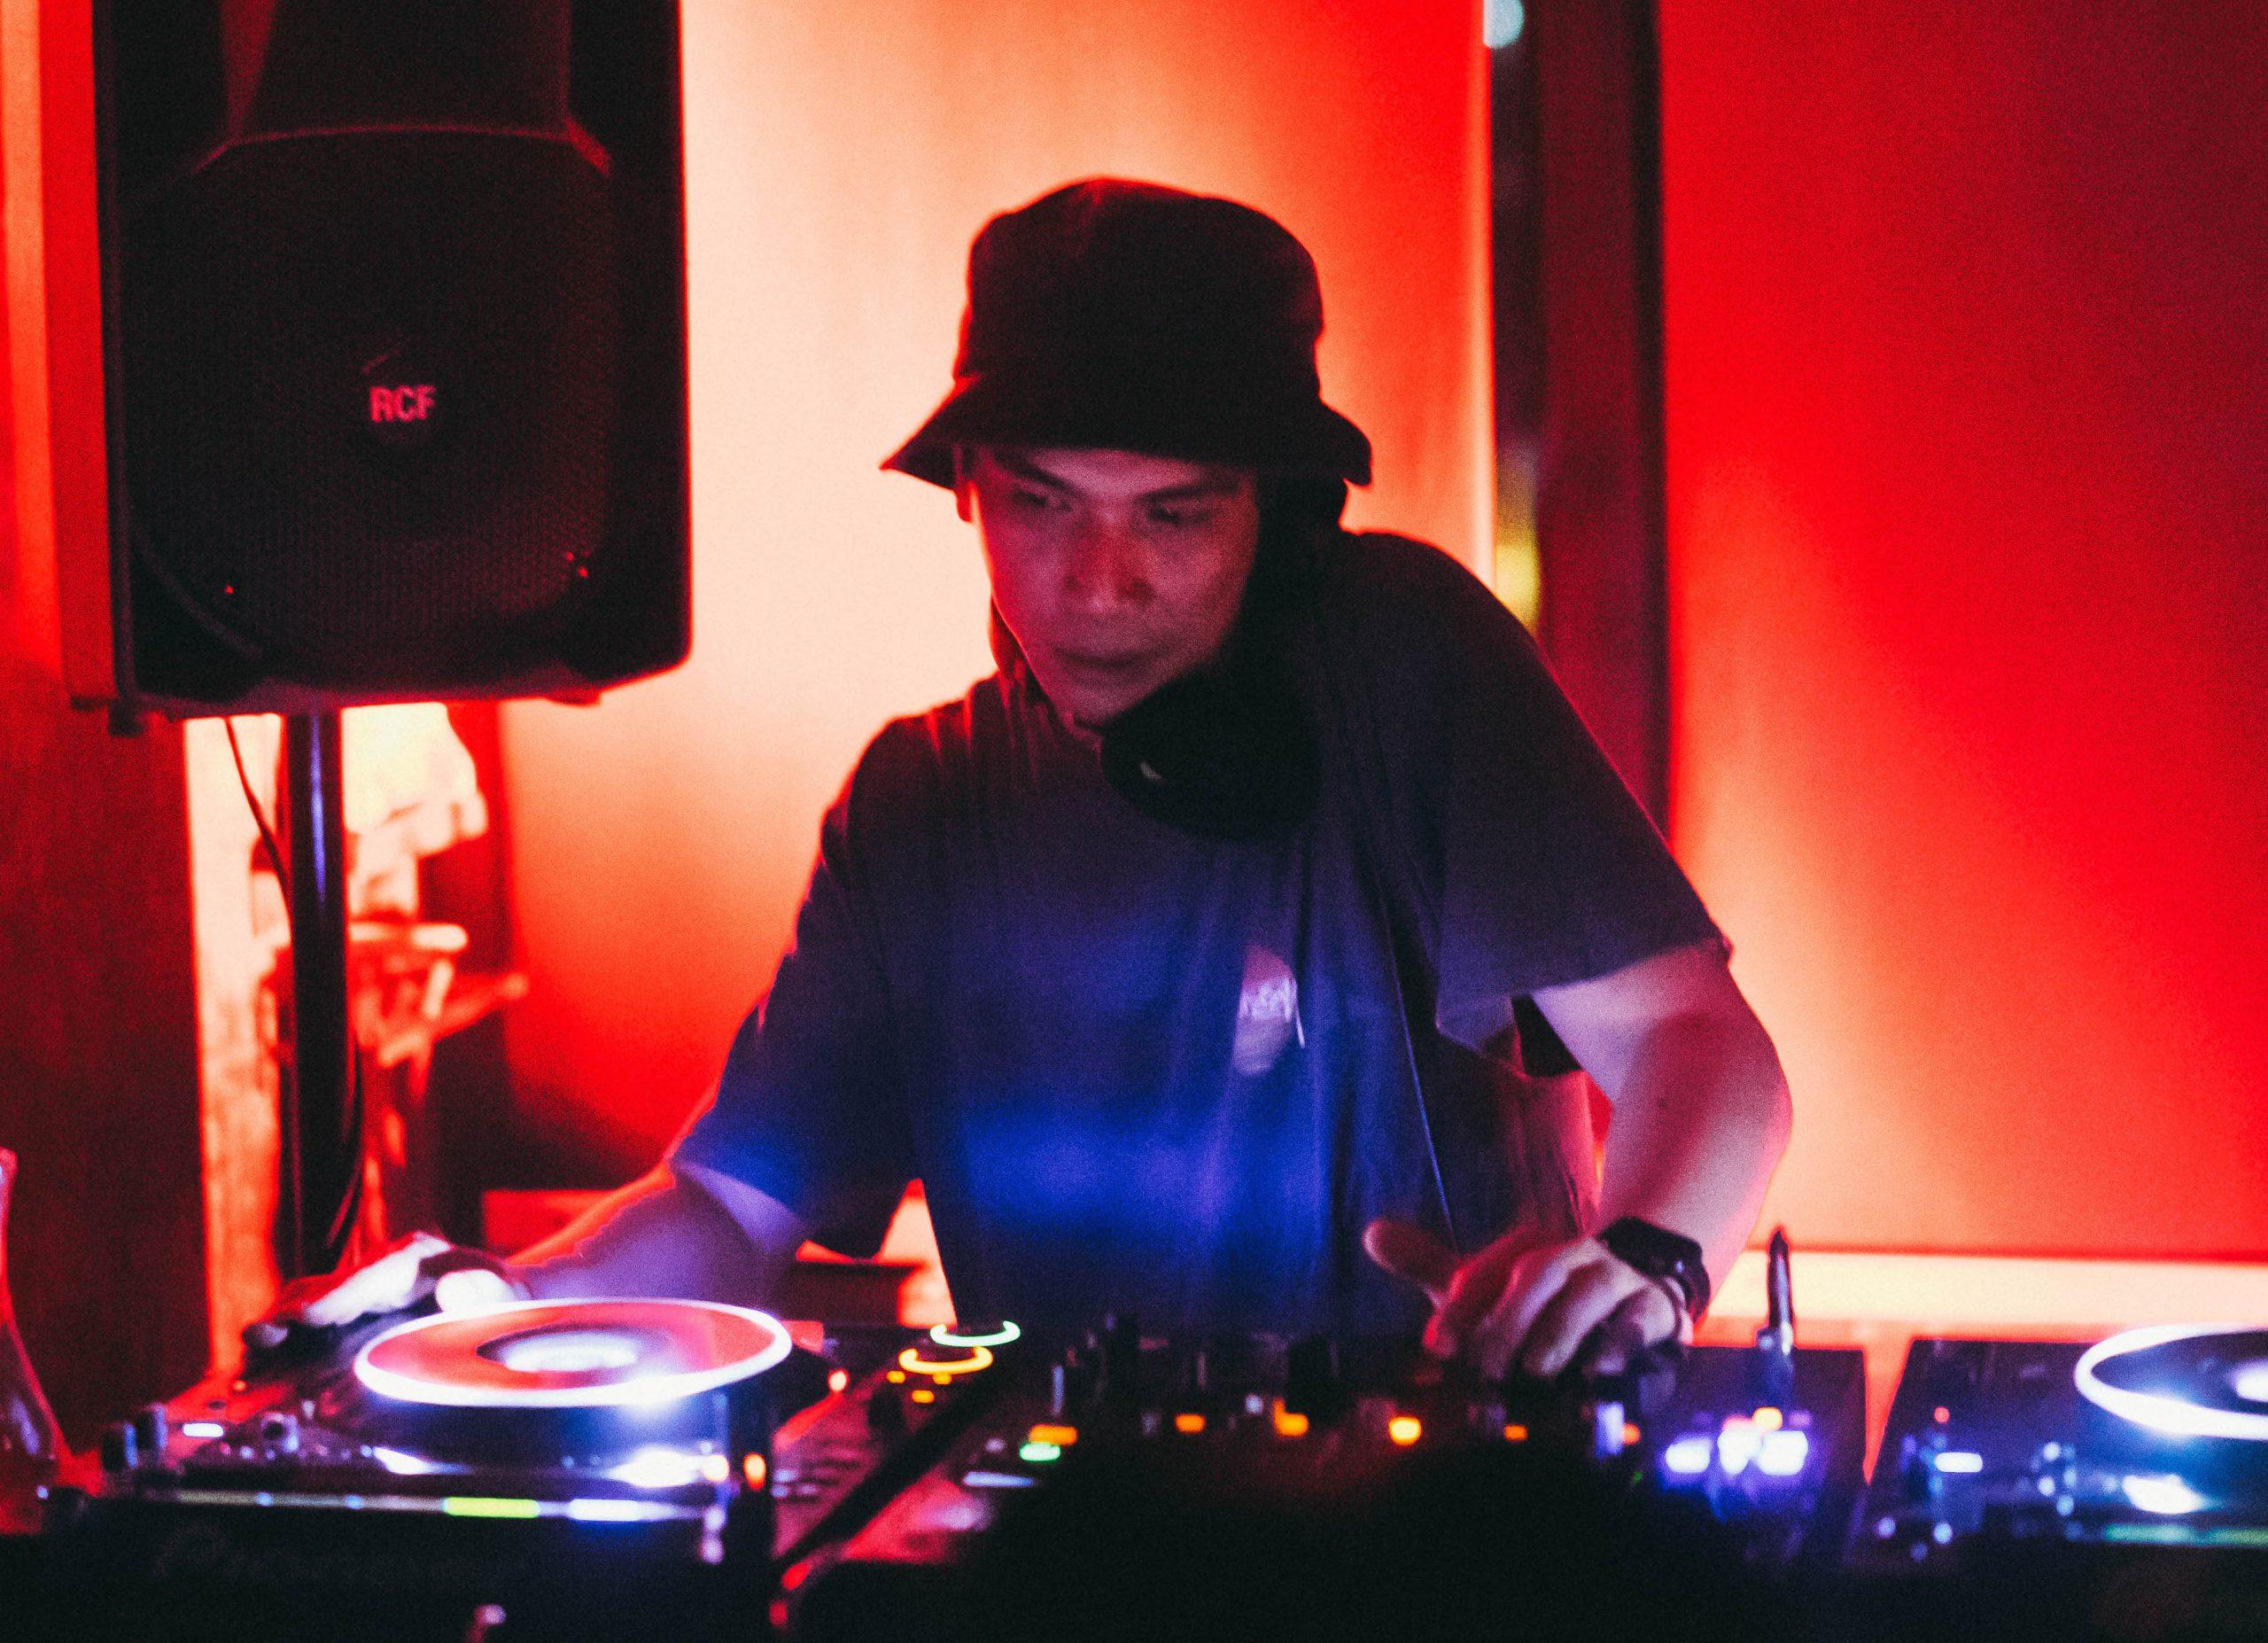 PREMIERE – Artificial – Son of a Gun (Komodo Remix) (We are Talking Machine)